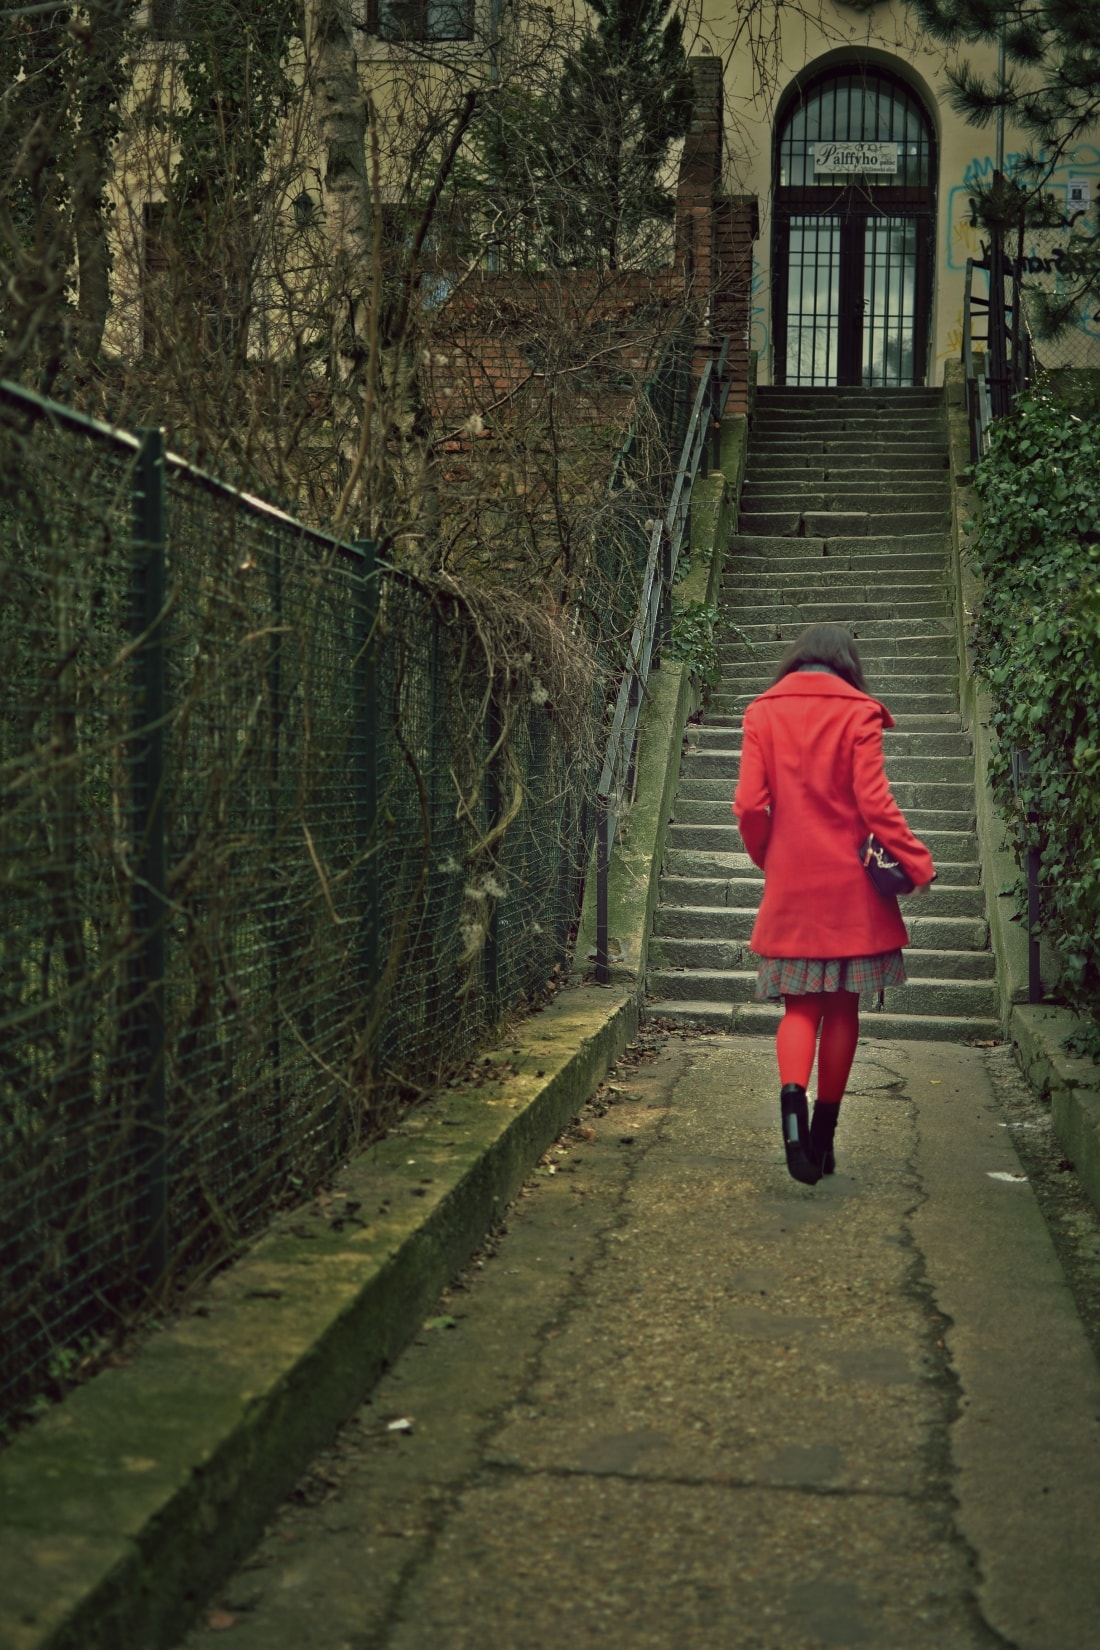 Červená_Katharine-fashion is beautiful_blog 1_Červené pančuchy_Červený kabát_Károvaná sukňa_Katarína Jakubčová_Fashion blogger_Outfit